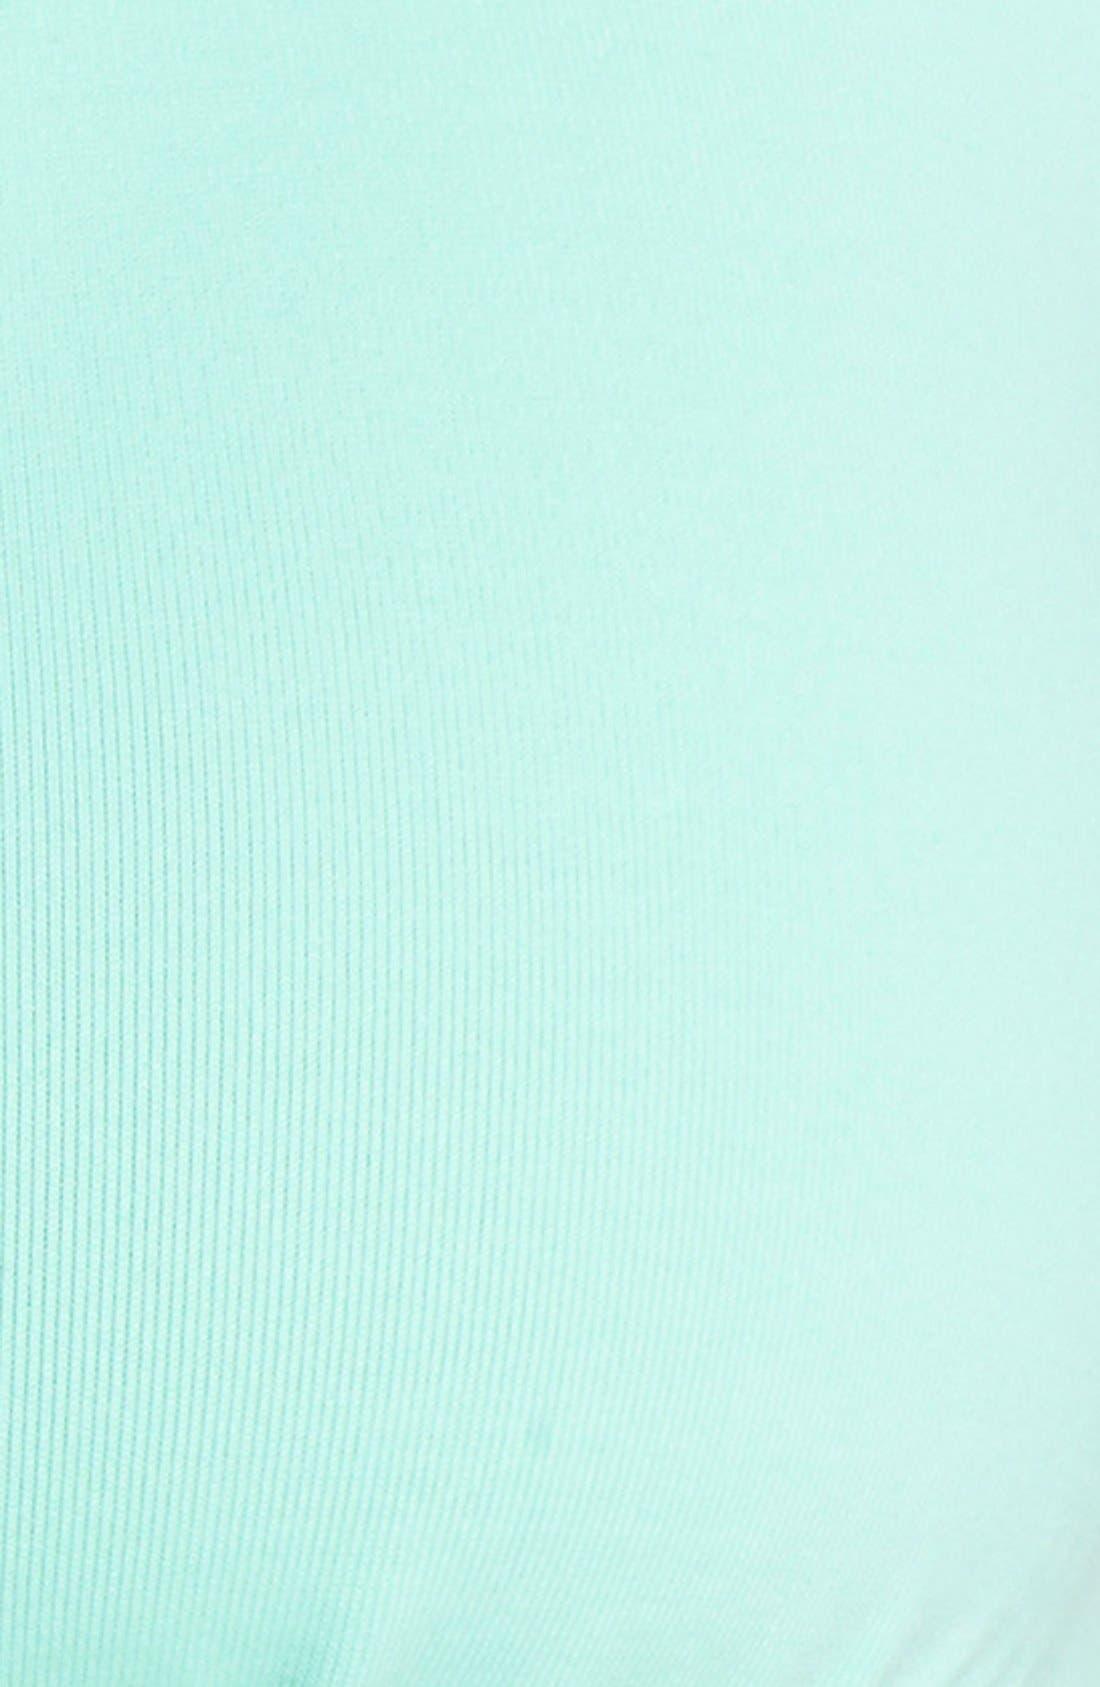 RIP CURL, 'Mirage' Reversible Bikini Top, Alternate thumbnail 2, color, 300